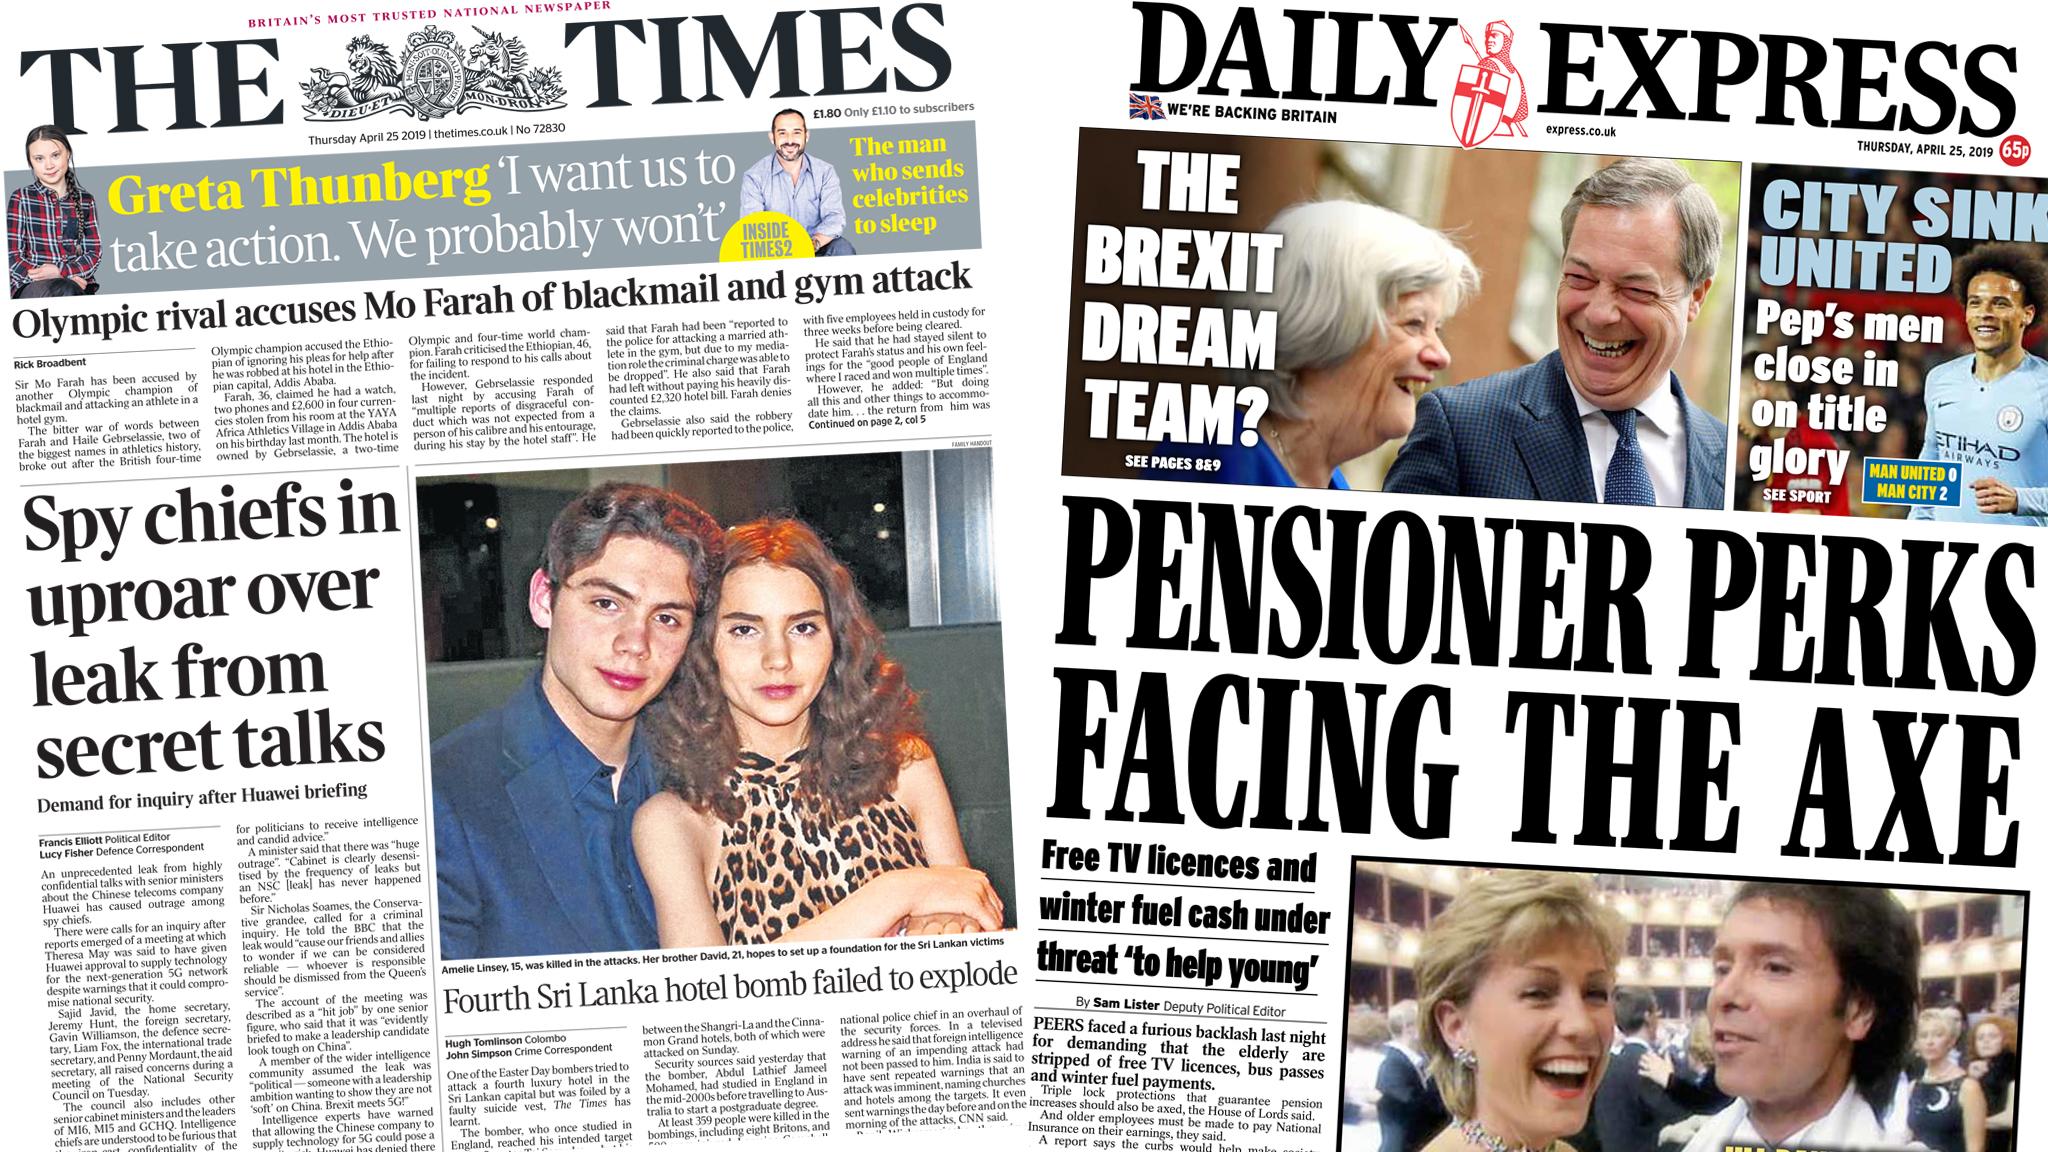 Newspaper headlines: Scrap 'pensioner perks' and secret talks leak